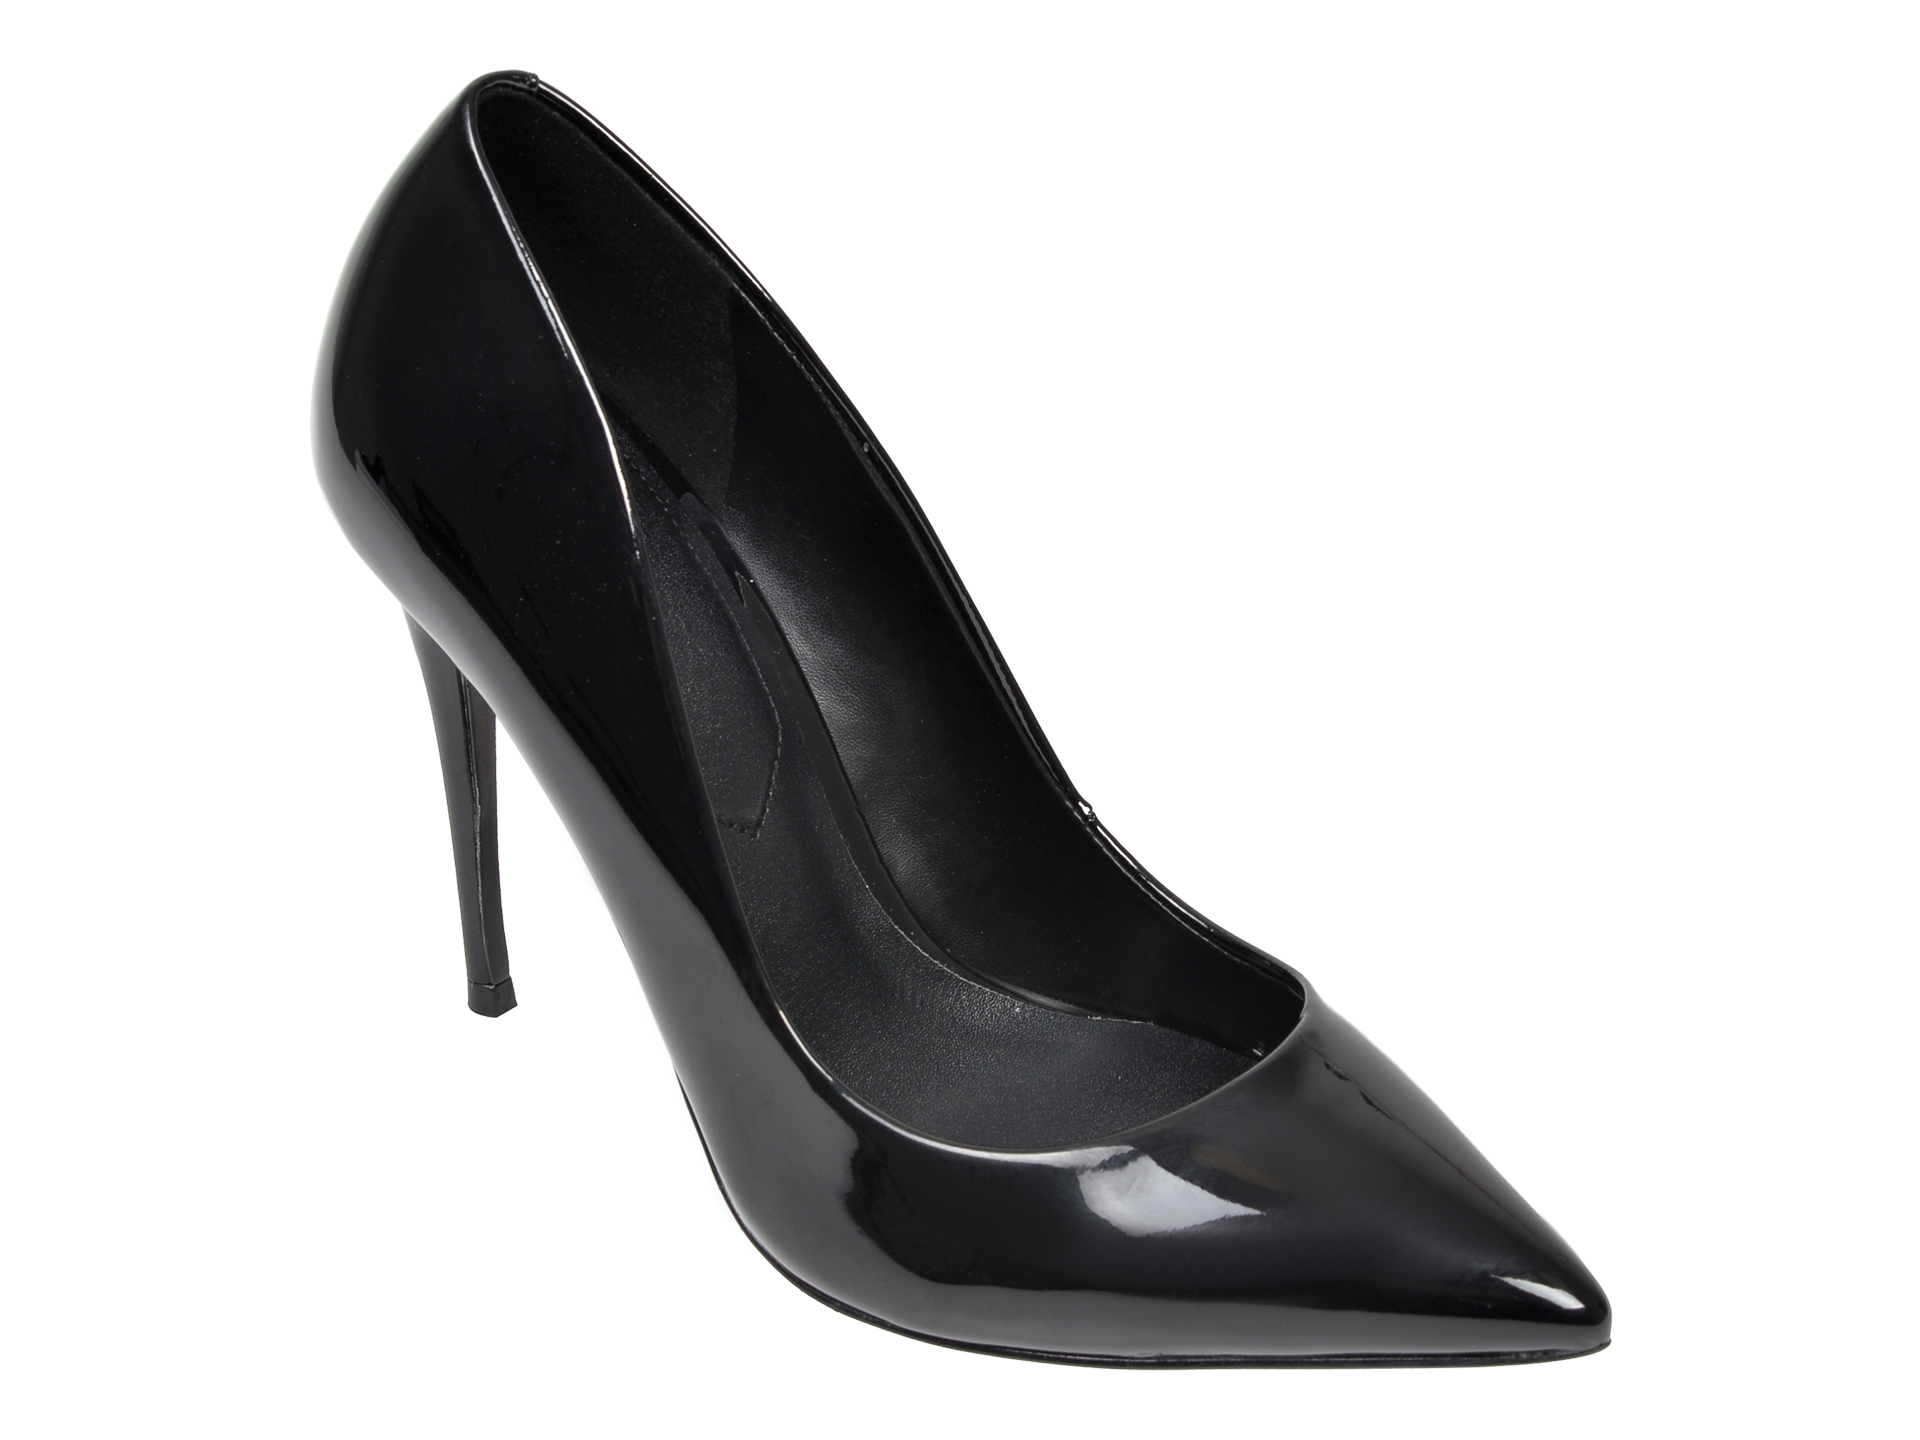 Pantofi ALDO negri, Stessy_009, din piele ecologica imagine otter.ro 2021